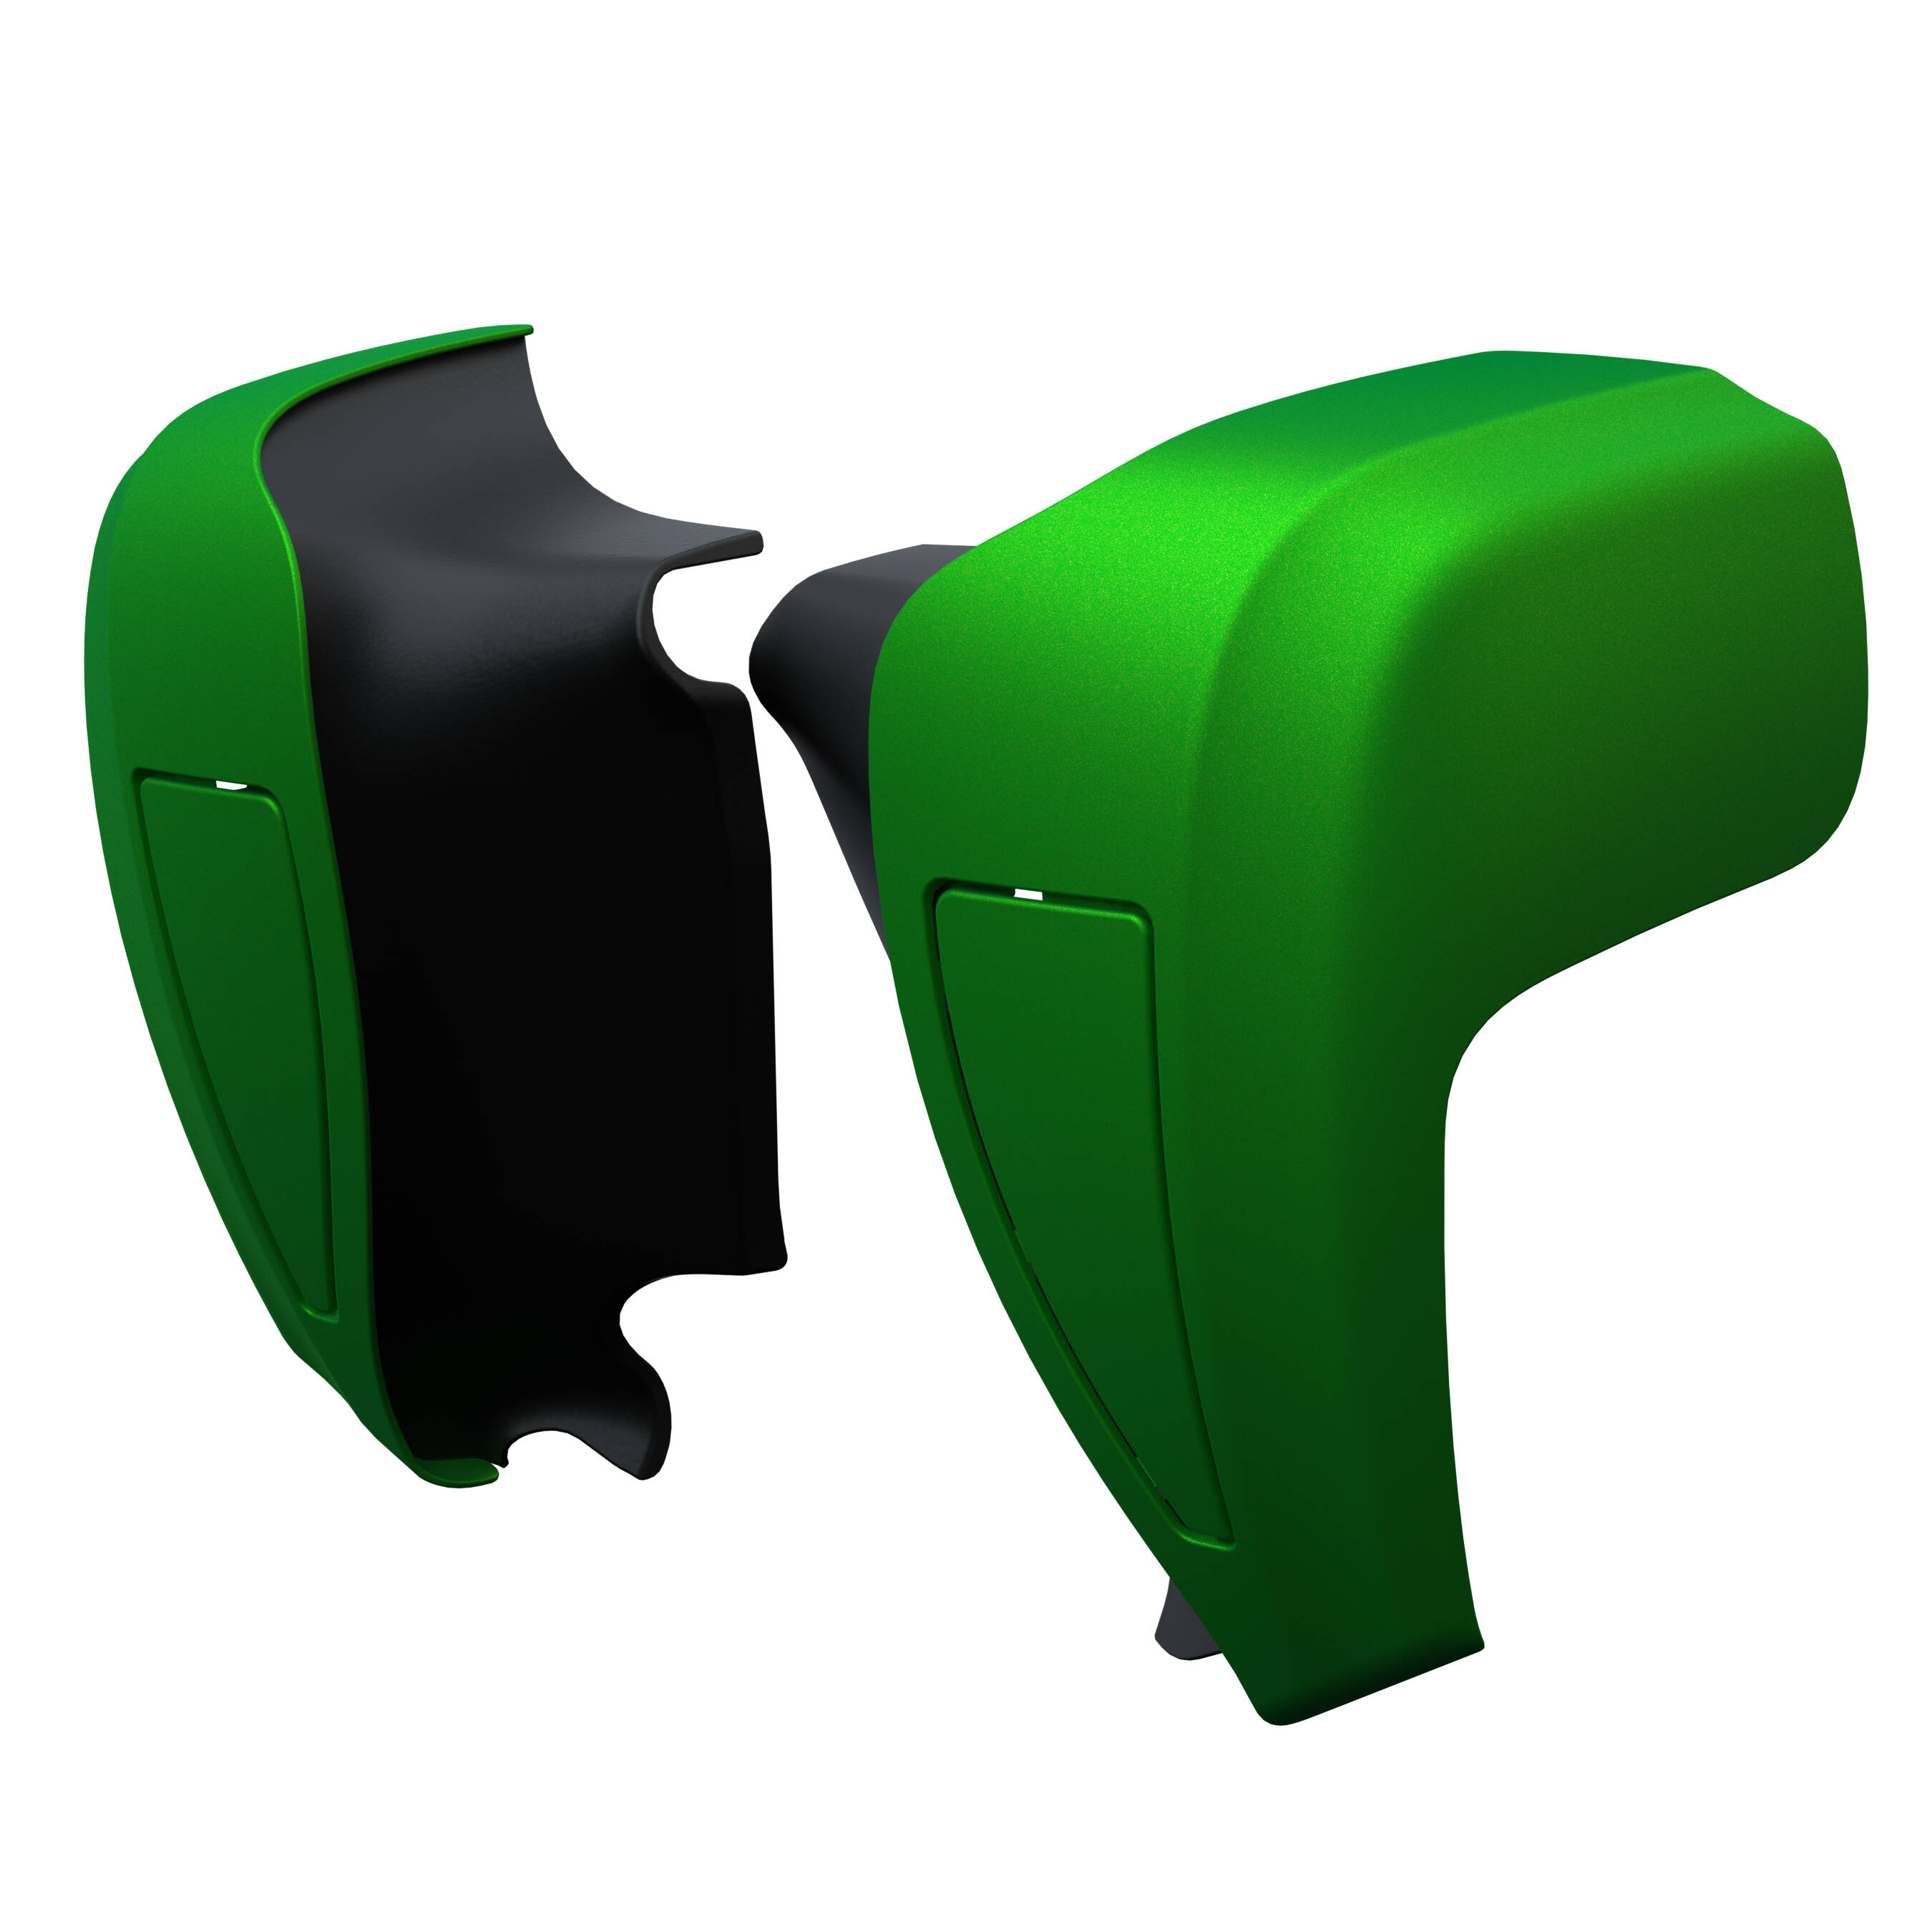 Hard Lower Fairings - Dragon Green